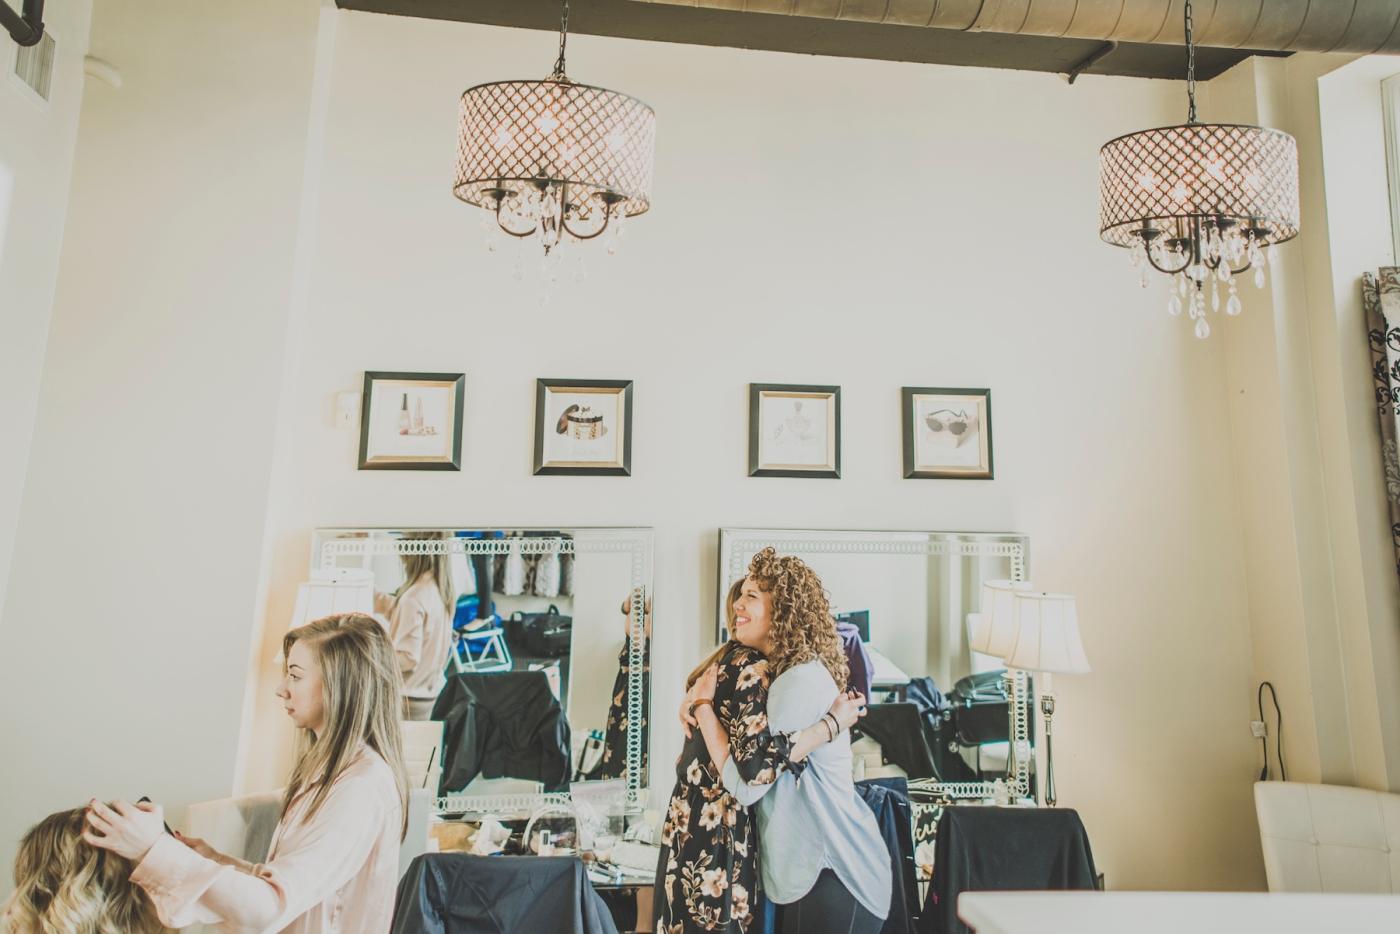 DSC_1760Everett_Wedding_Ballroom_Jane_Speleers_photography_Rachel_and_Edmund_Getting_ready_2017